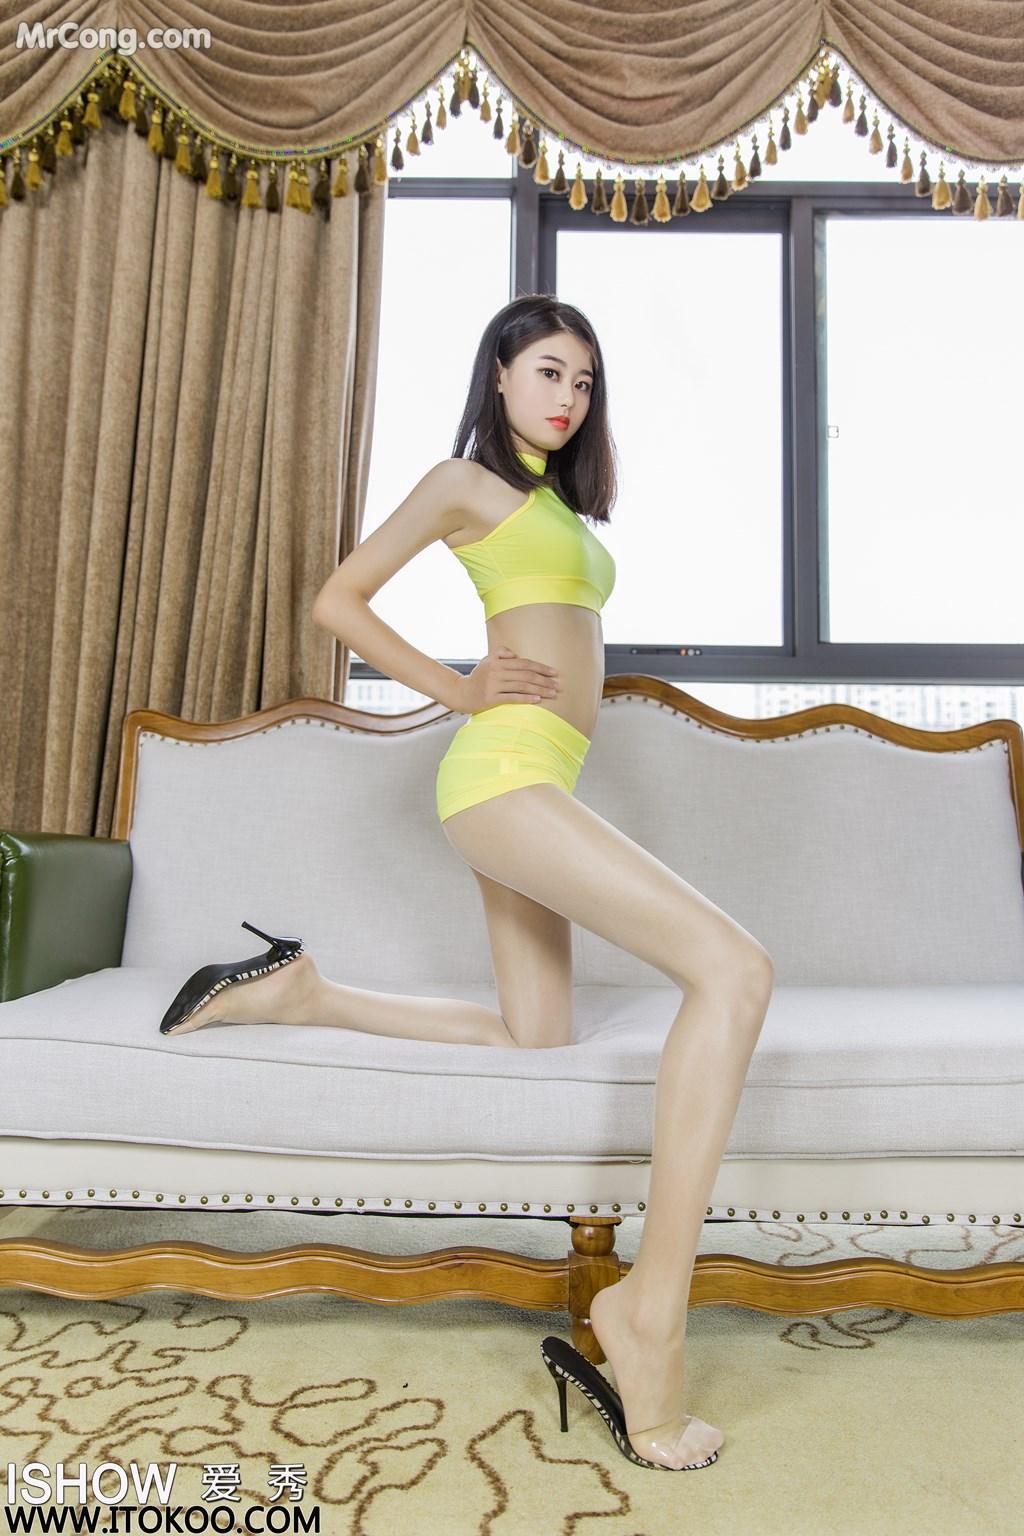 Image ISHOW-No.176-Liu-Yue-Fei-Phoebe-MrCong.com-008 in post ISHOW No.176: Người mẫu Liu Yue Fei (刘玥菲Phoebe) (31 ảnh)